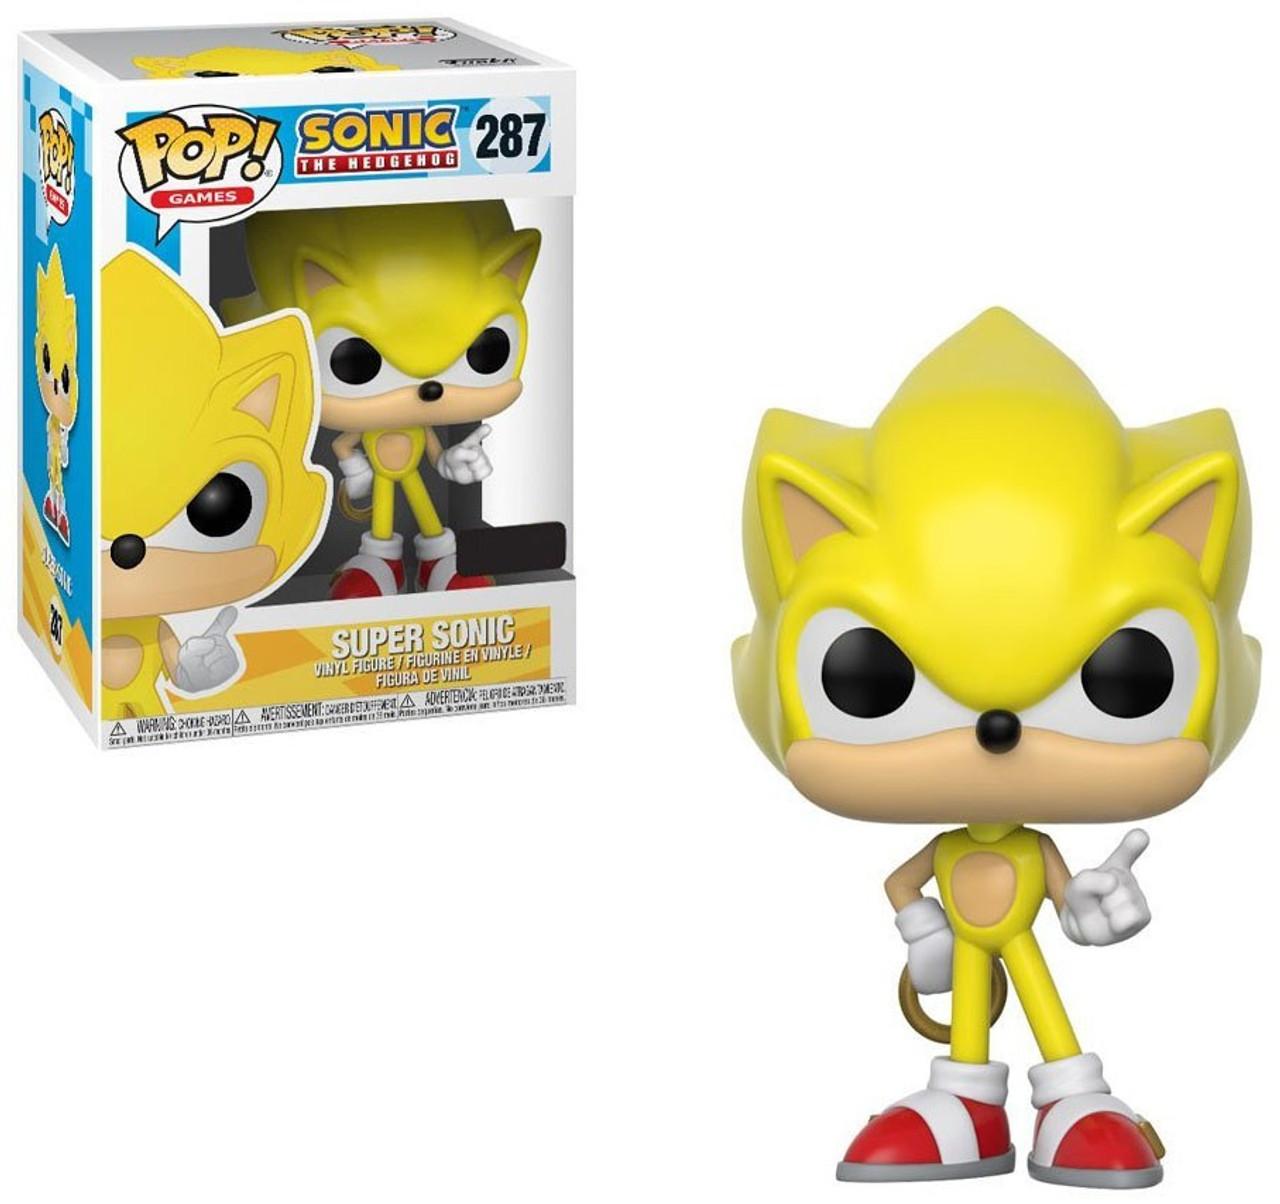 dd7c1ed5efe Funko Sonic The Hedgehog Funko POP Games Super Sonic Exclusive Vinyl Figure  287 - ToyWiz